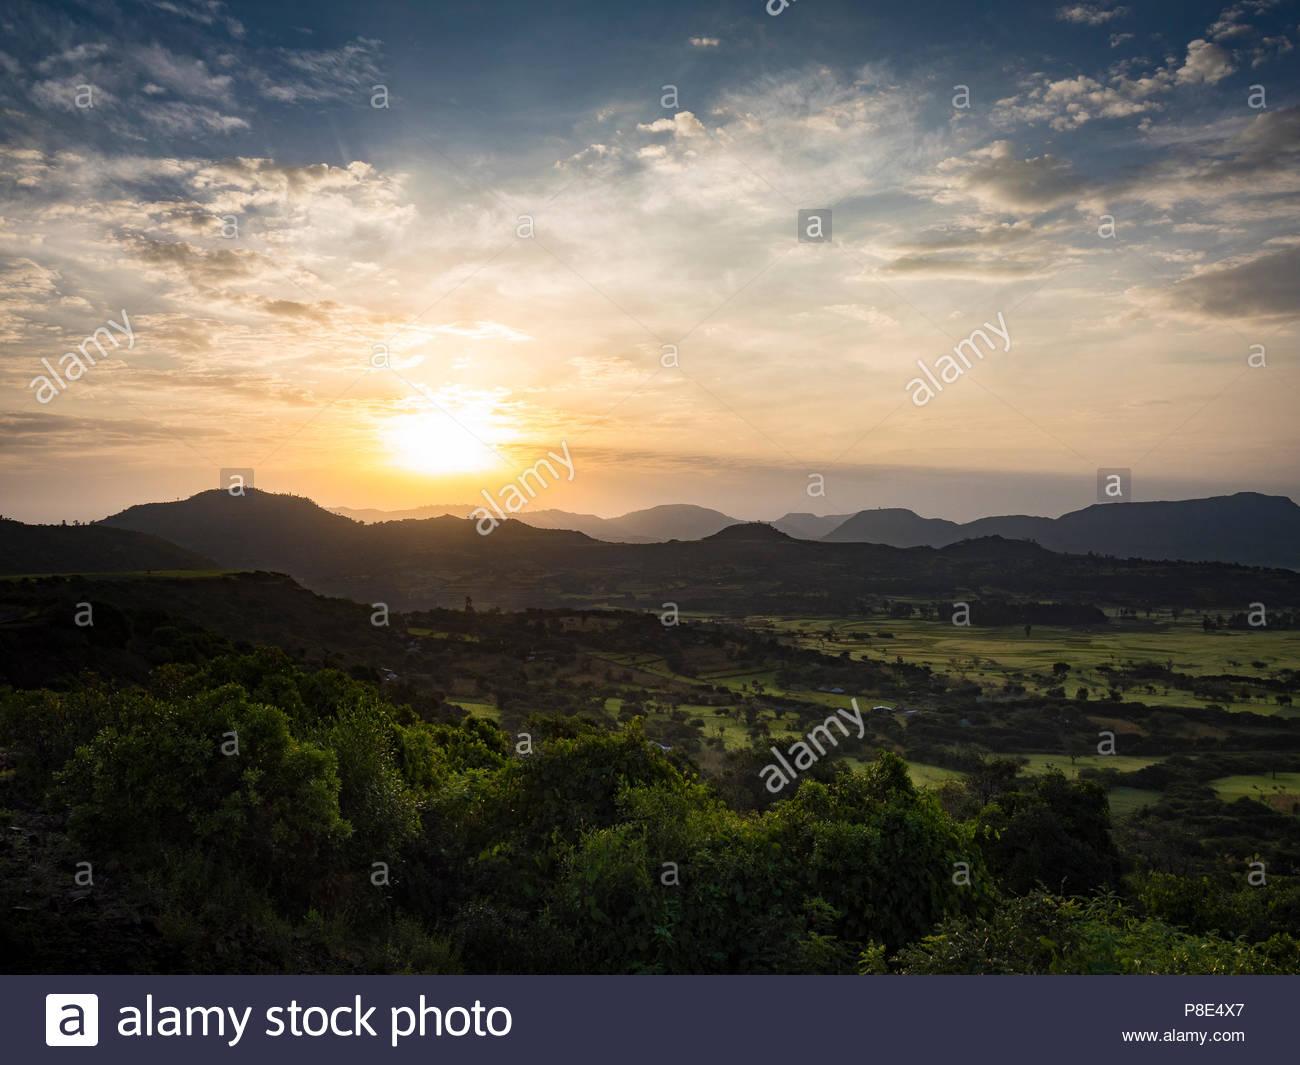 Mountainous green landscape at sunrise, at Axum, Ethiopia - Stock Image